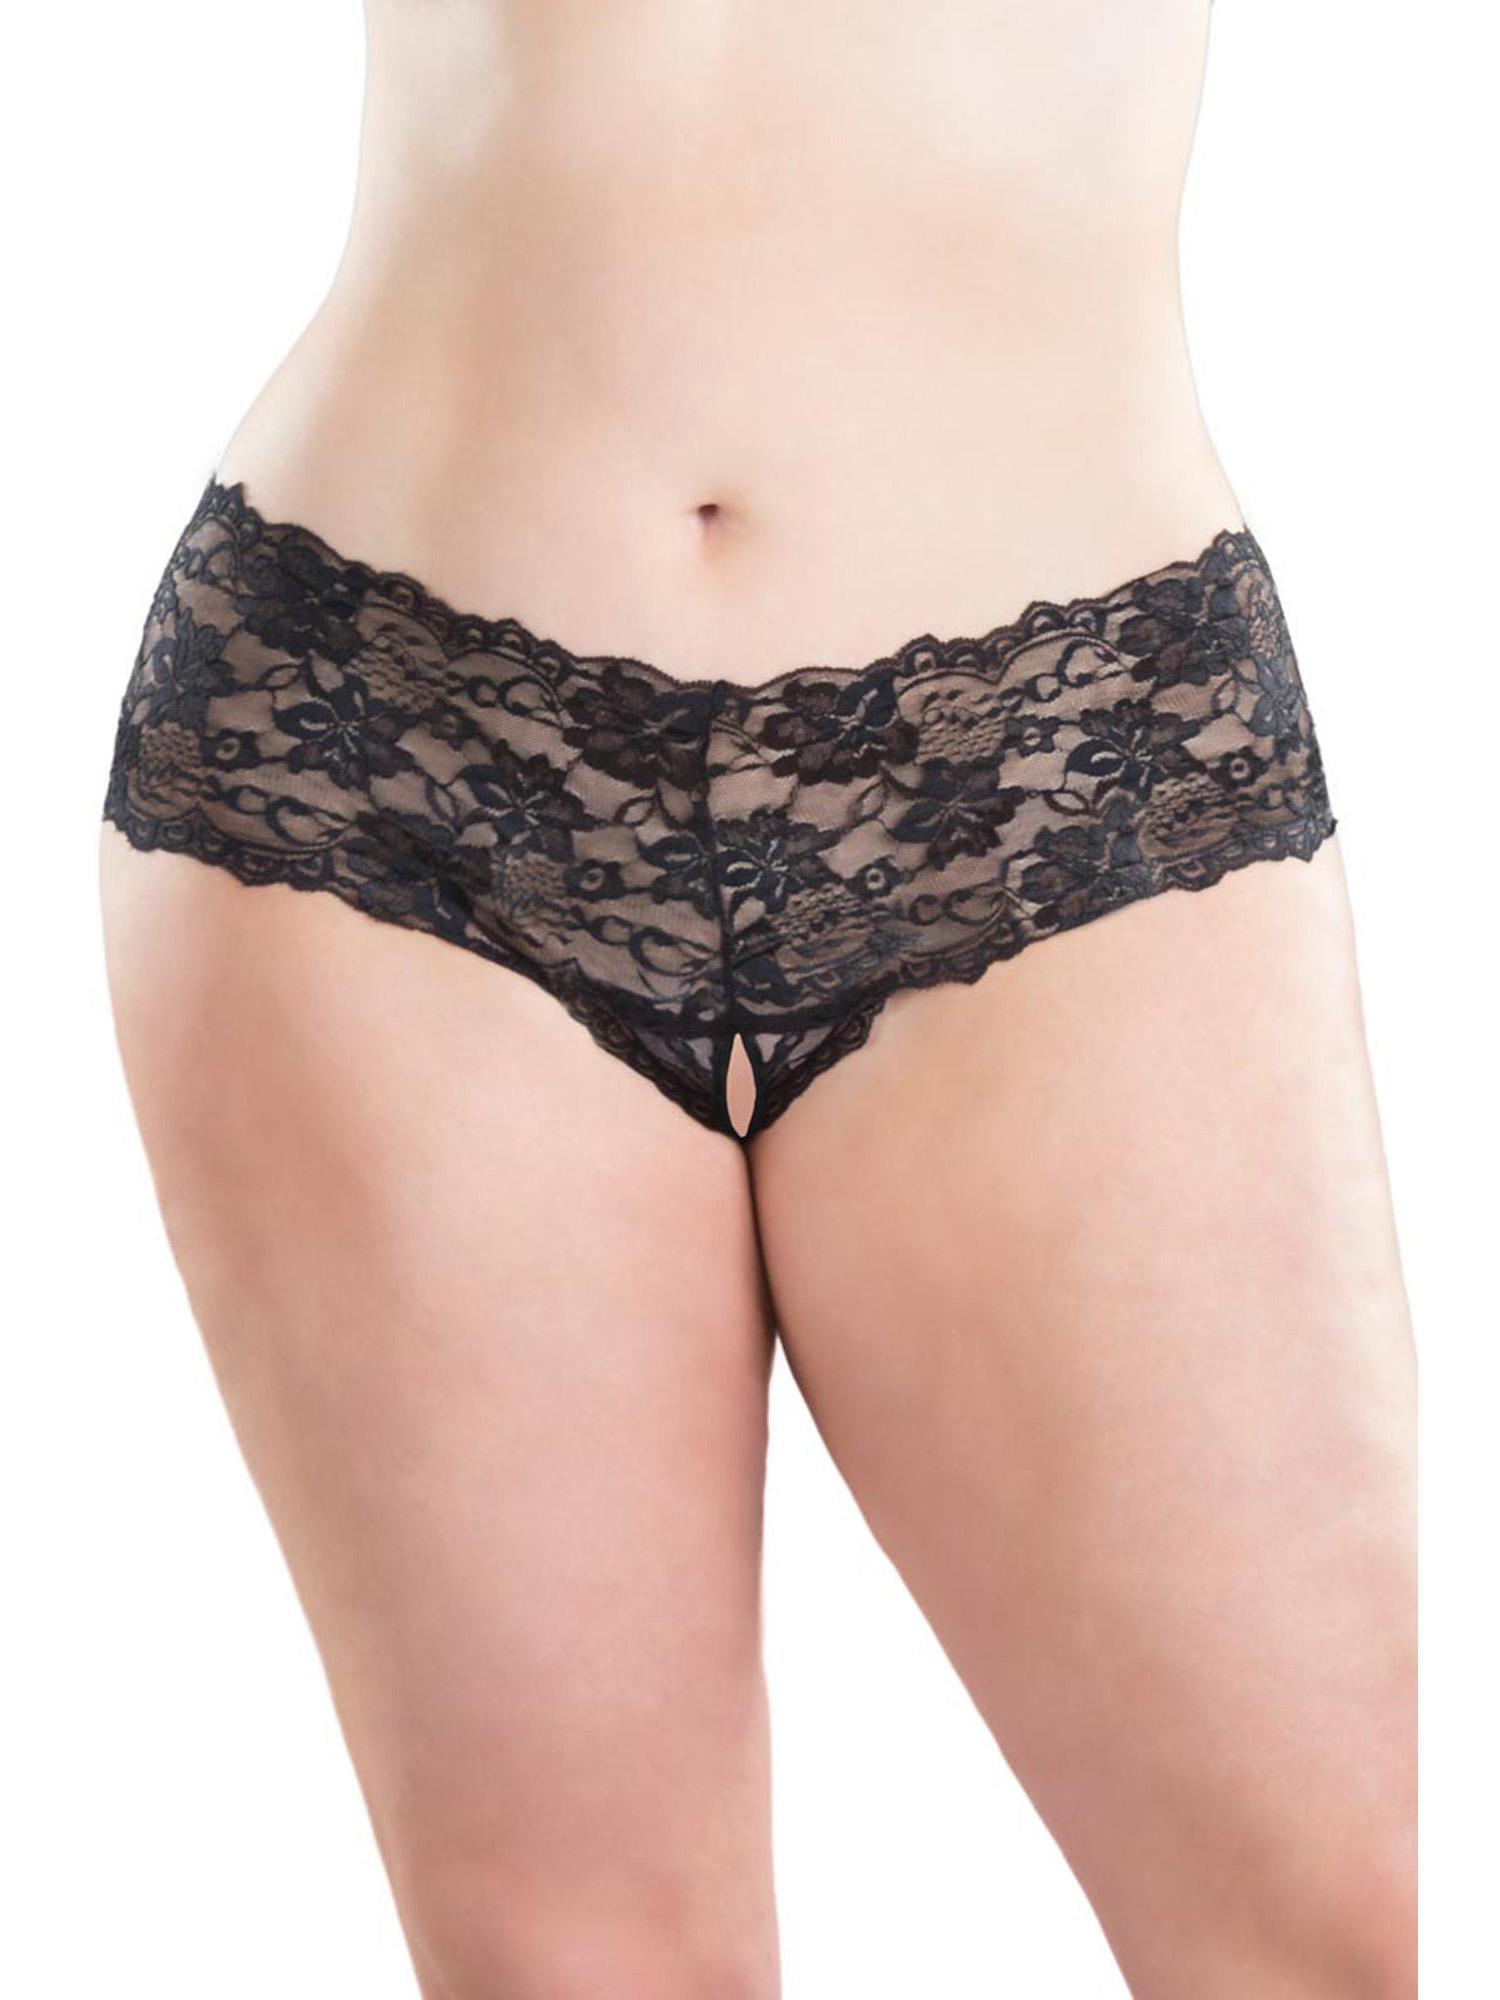 Full Size Panties 21